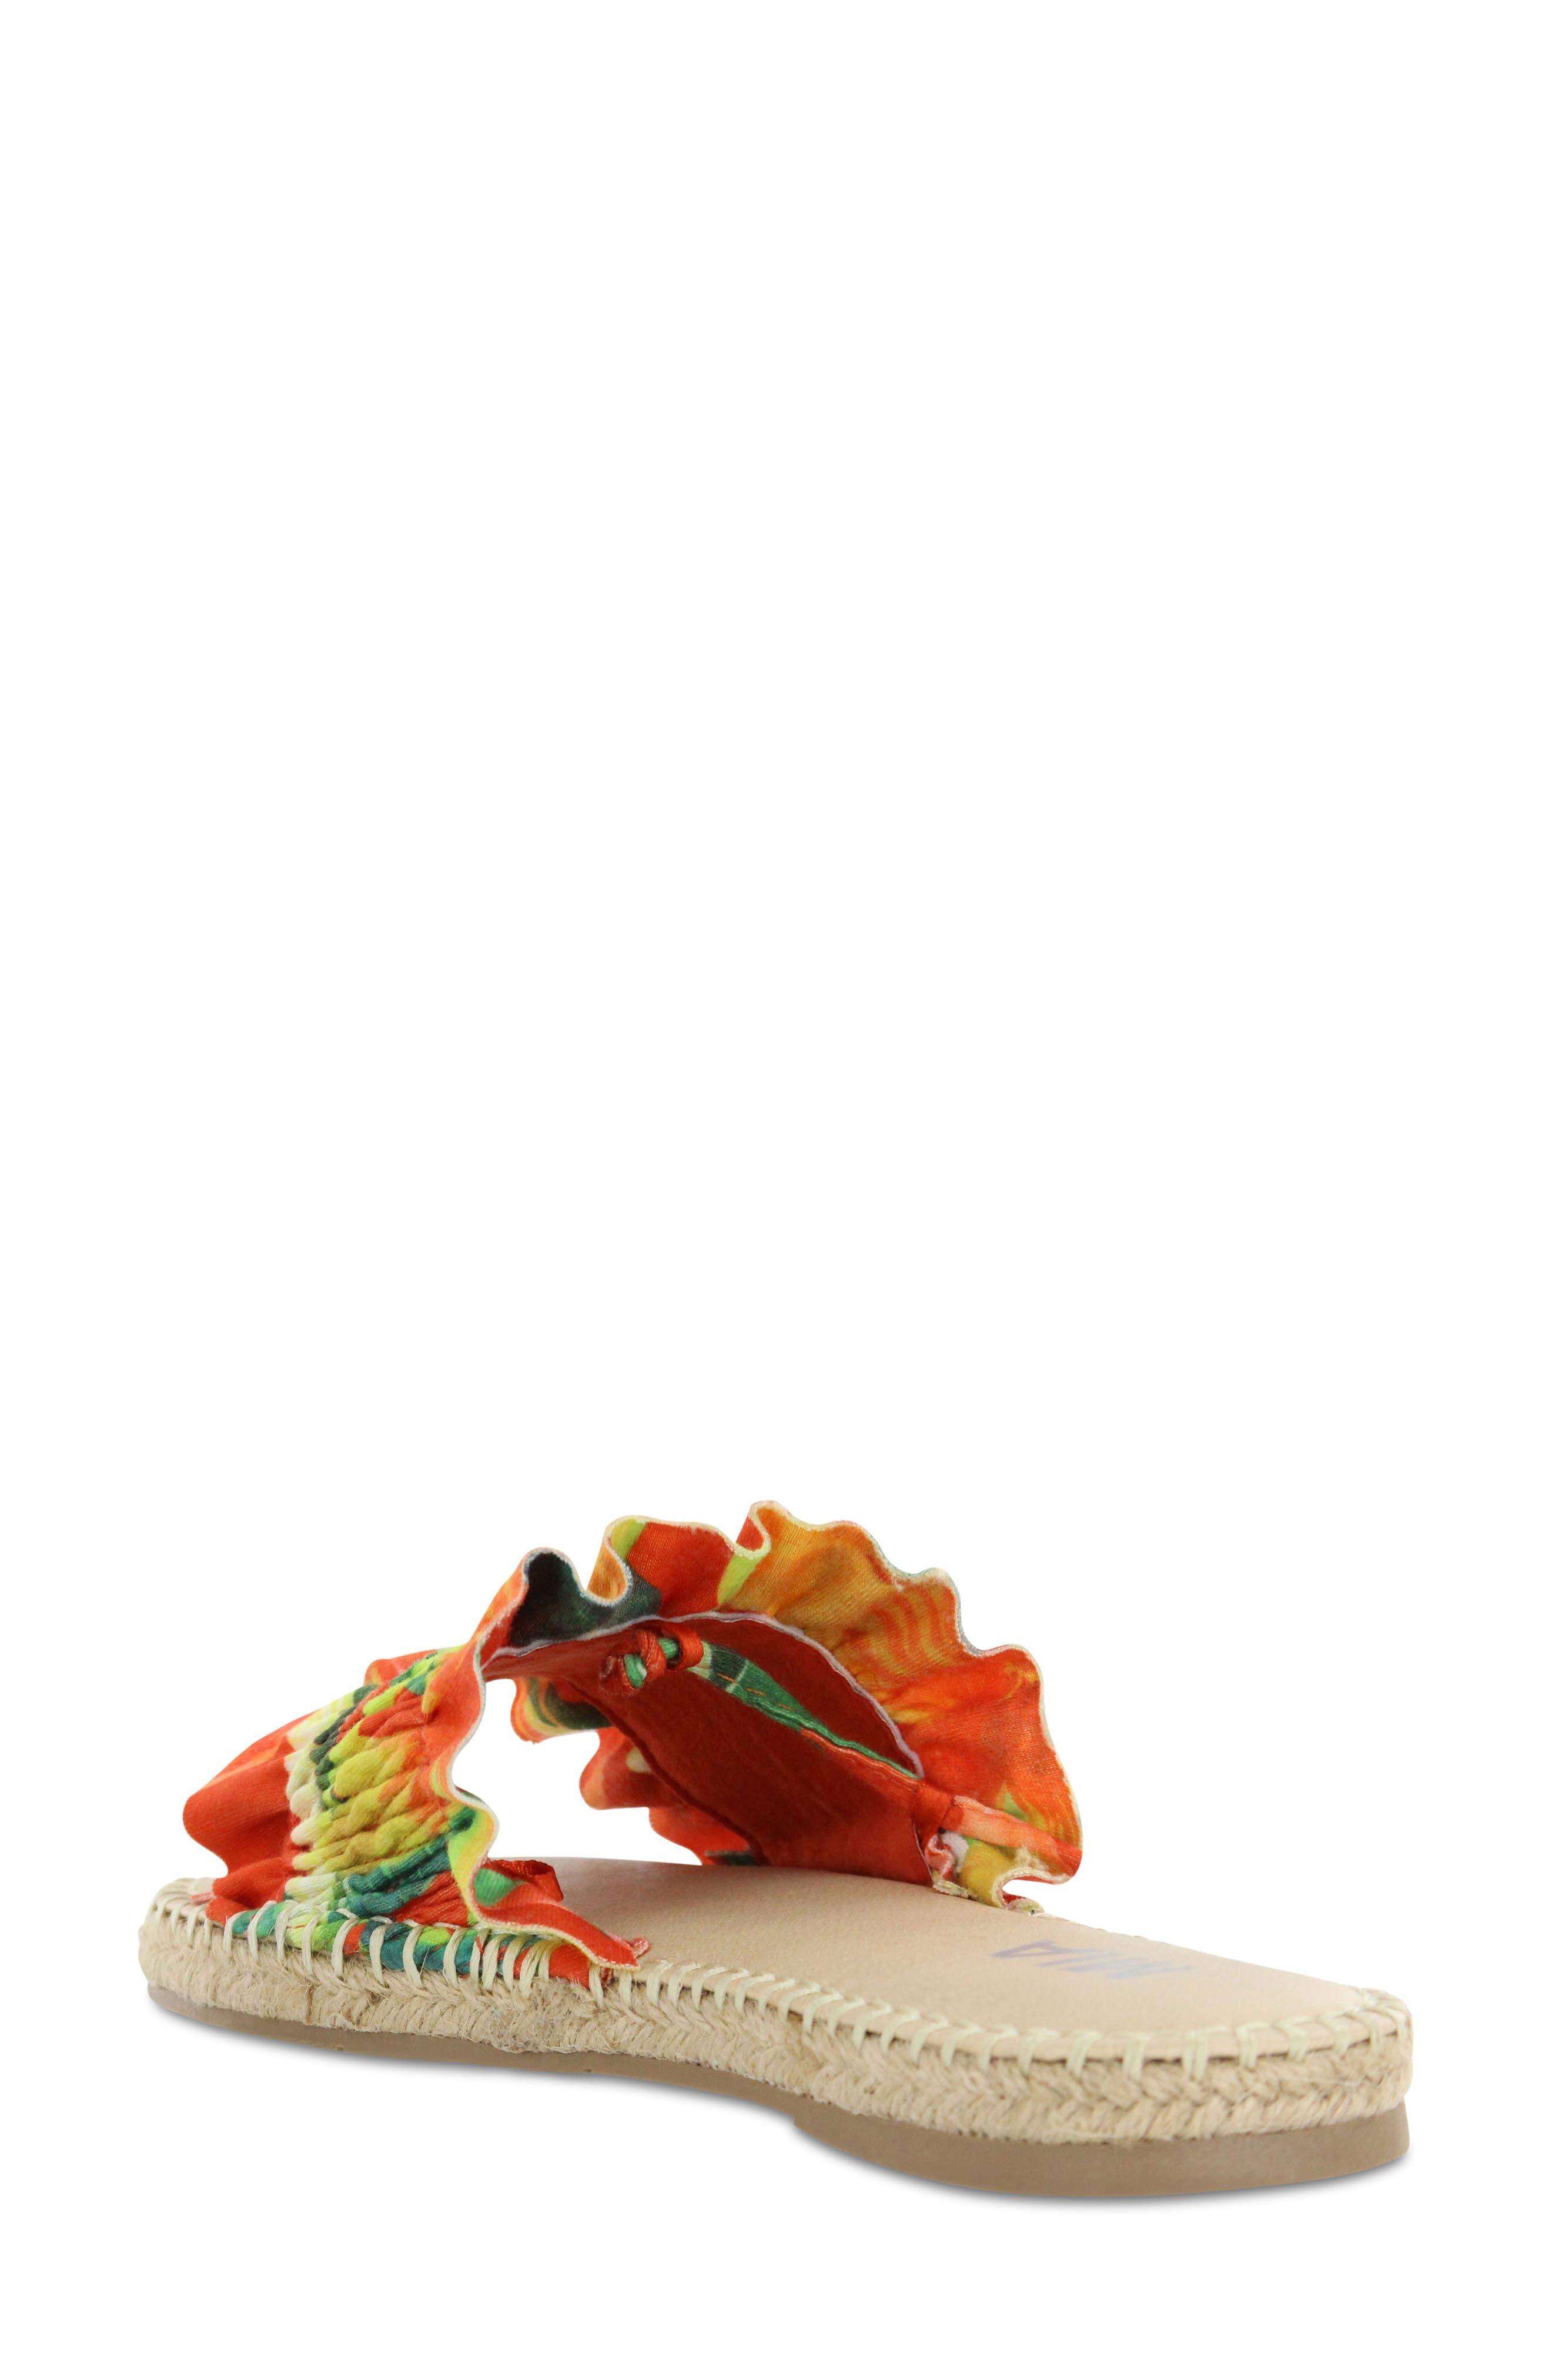 Annalise Sandal,                             Alternate thumbnail 2, color,                             Red Amazon Scrunch Fabric